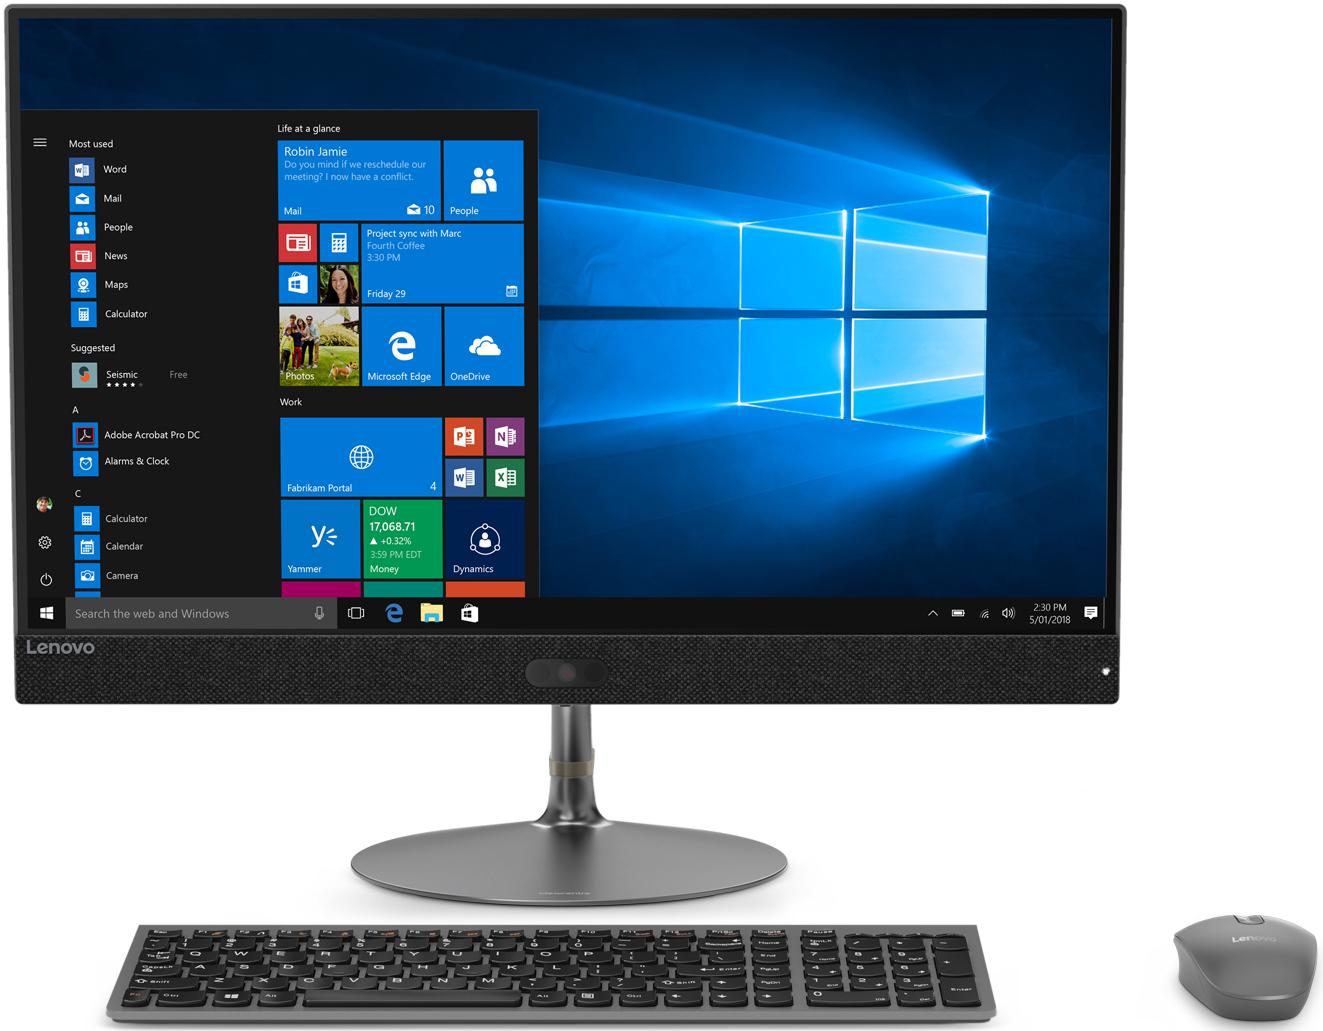 Моноблок Lenovo IdeaCentre 730S-24IKB, F0DY001QRK, 23.8, темно-серый моноблок lenovo v510z 10nq001qru 23 темно серый